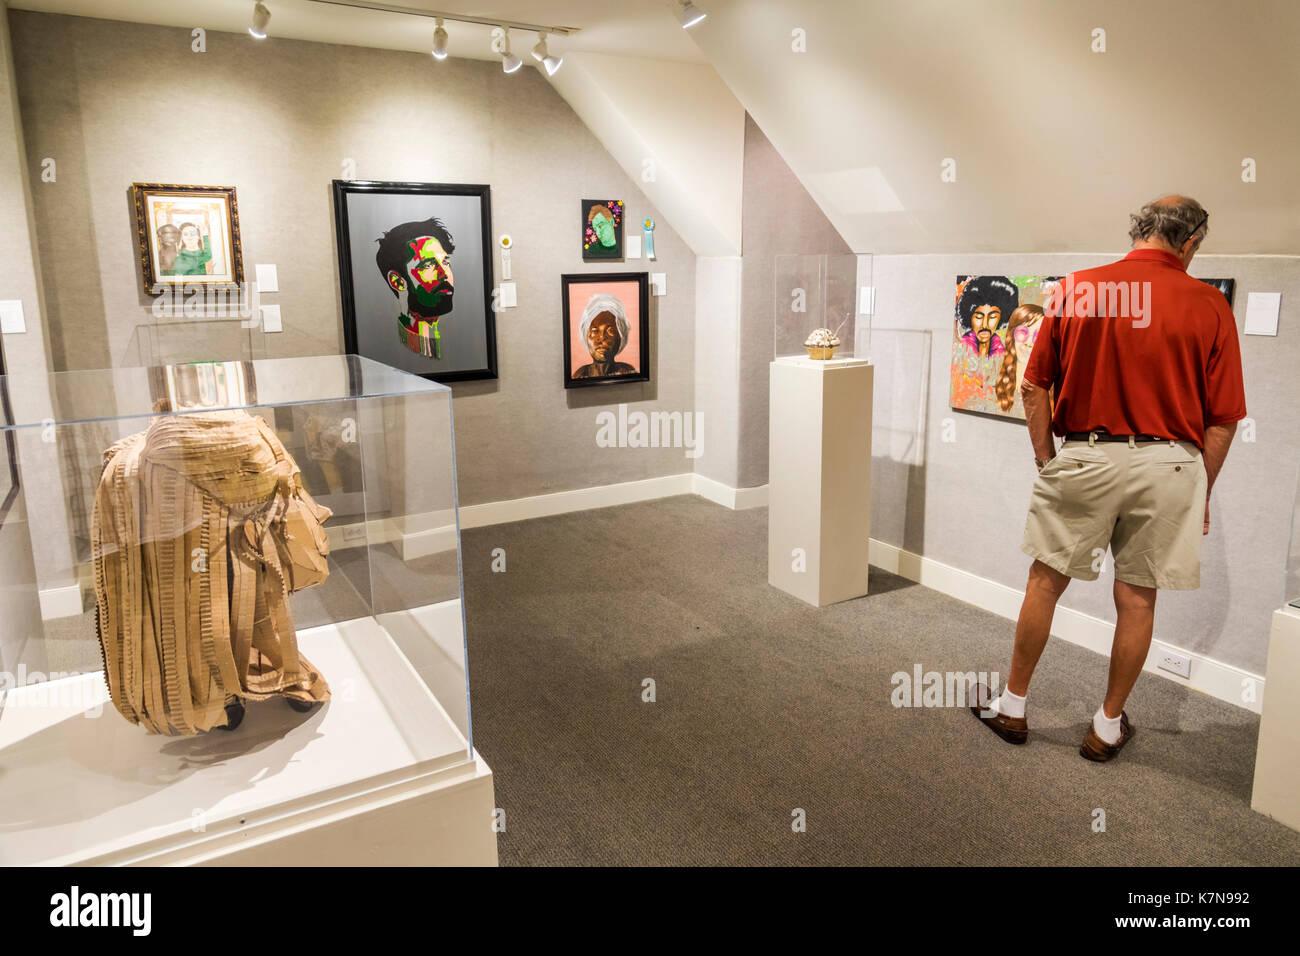 Myrtle Beach South Carolina SC Franklin G. Burroughs-Simeon B. Chapin Art Museum exhibit gallery painting artwork - Stock Image